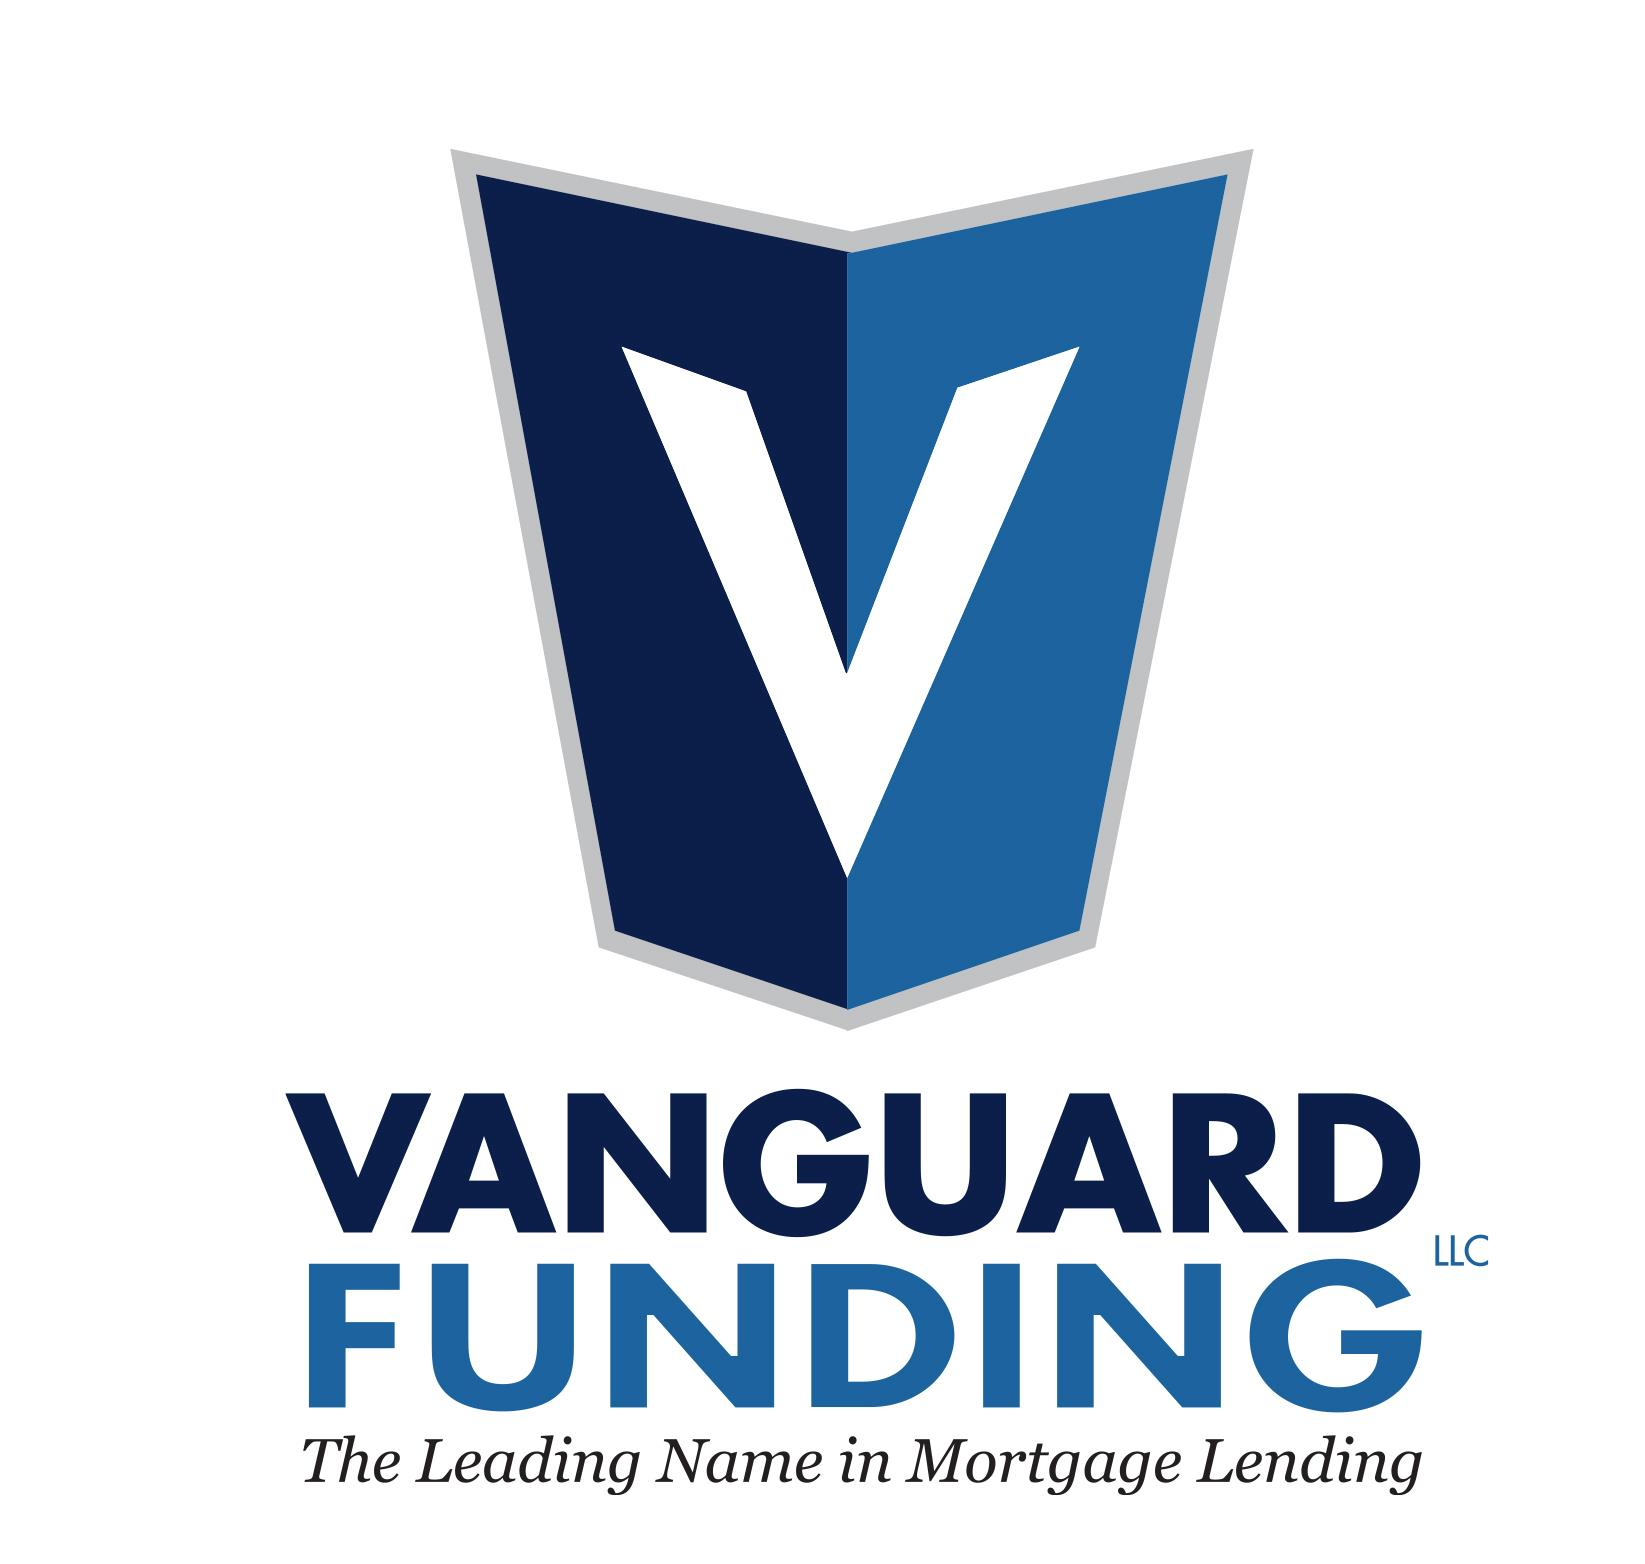 Vanguard funding robert tuzzo new york ny for 140 broadway 46th floor